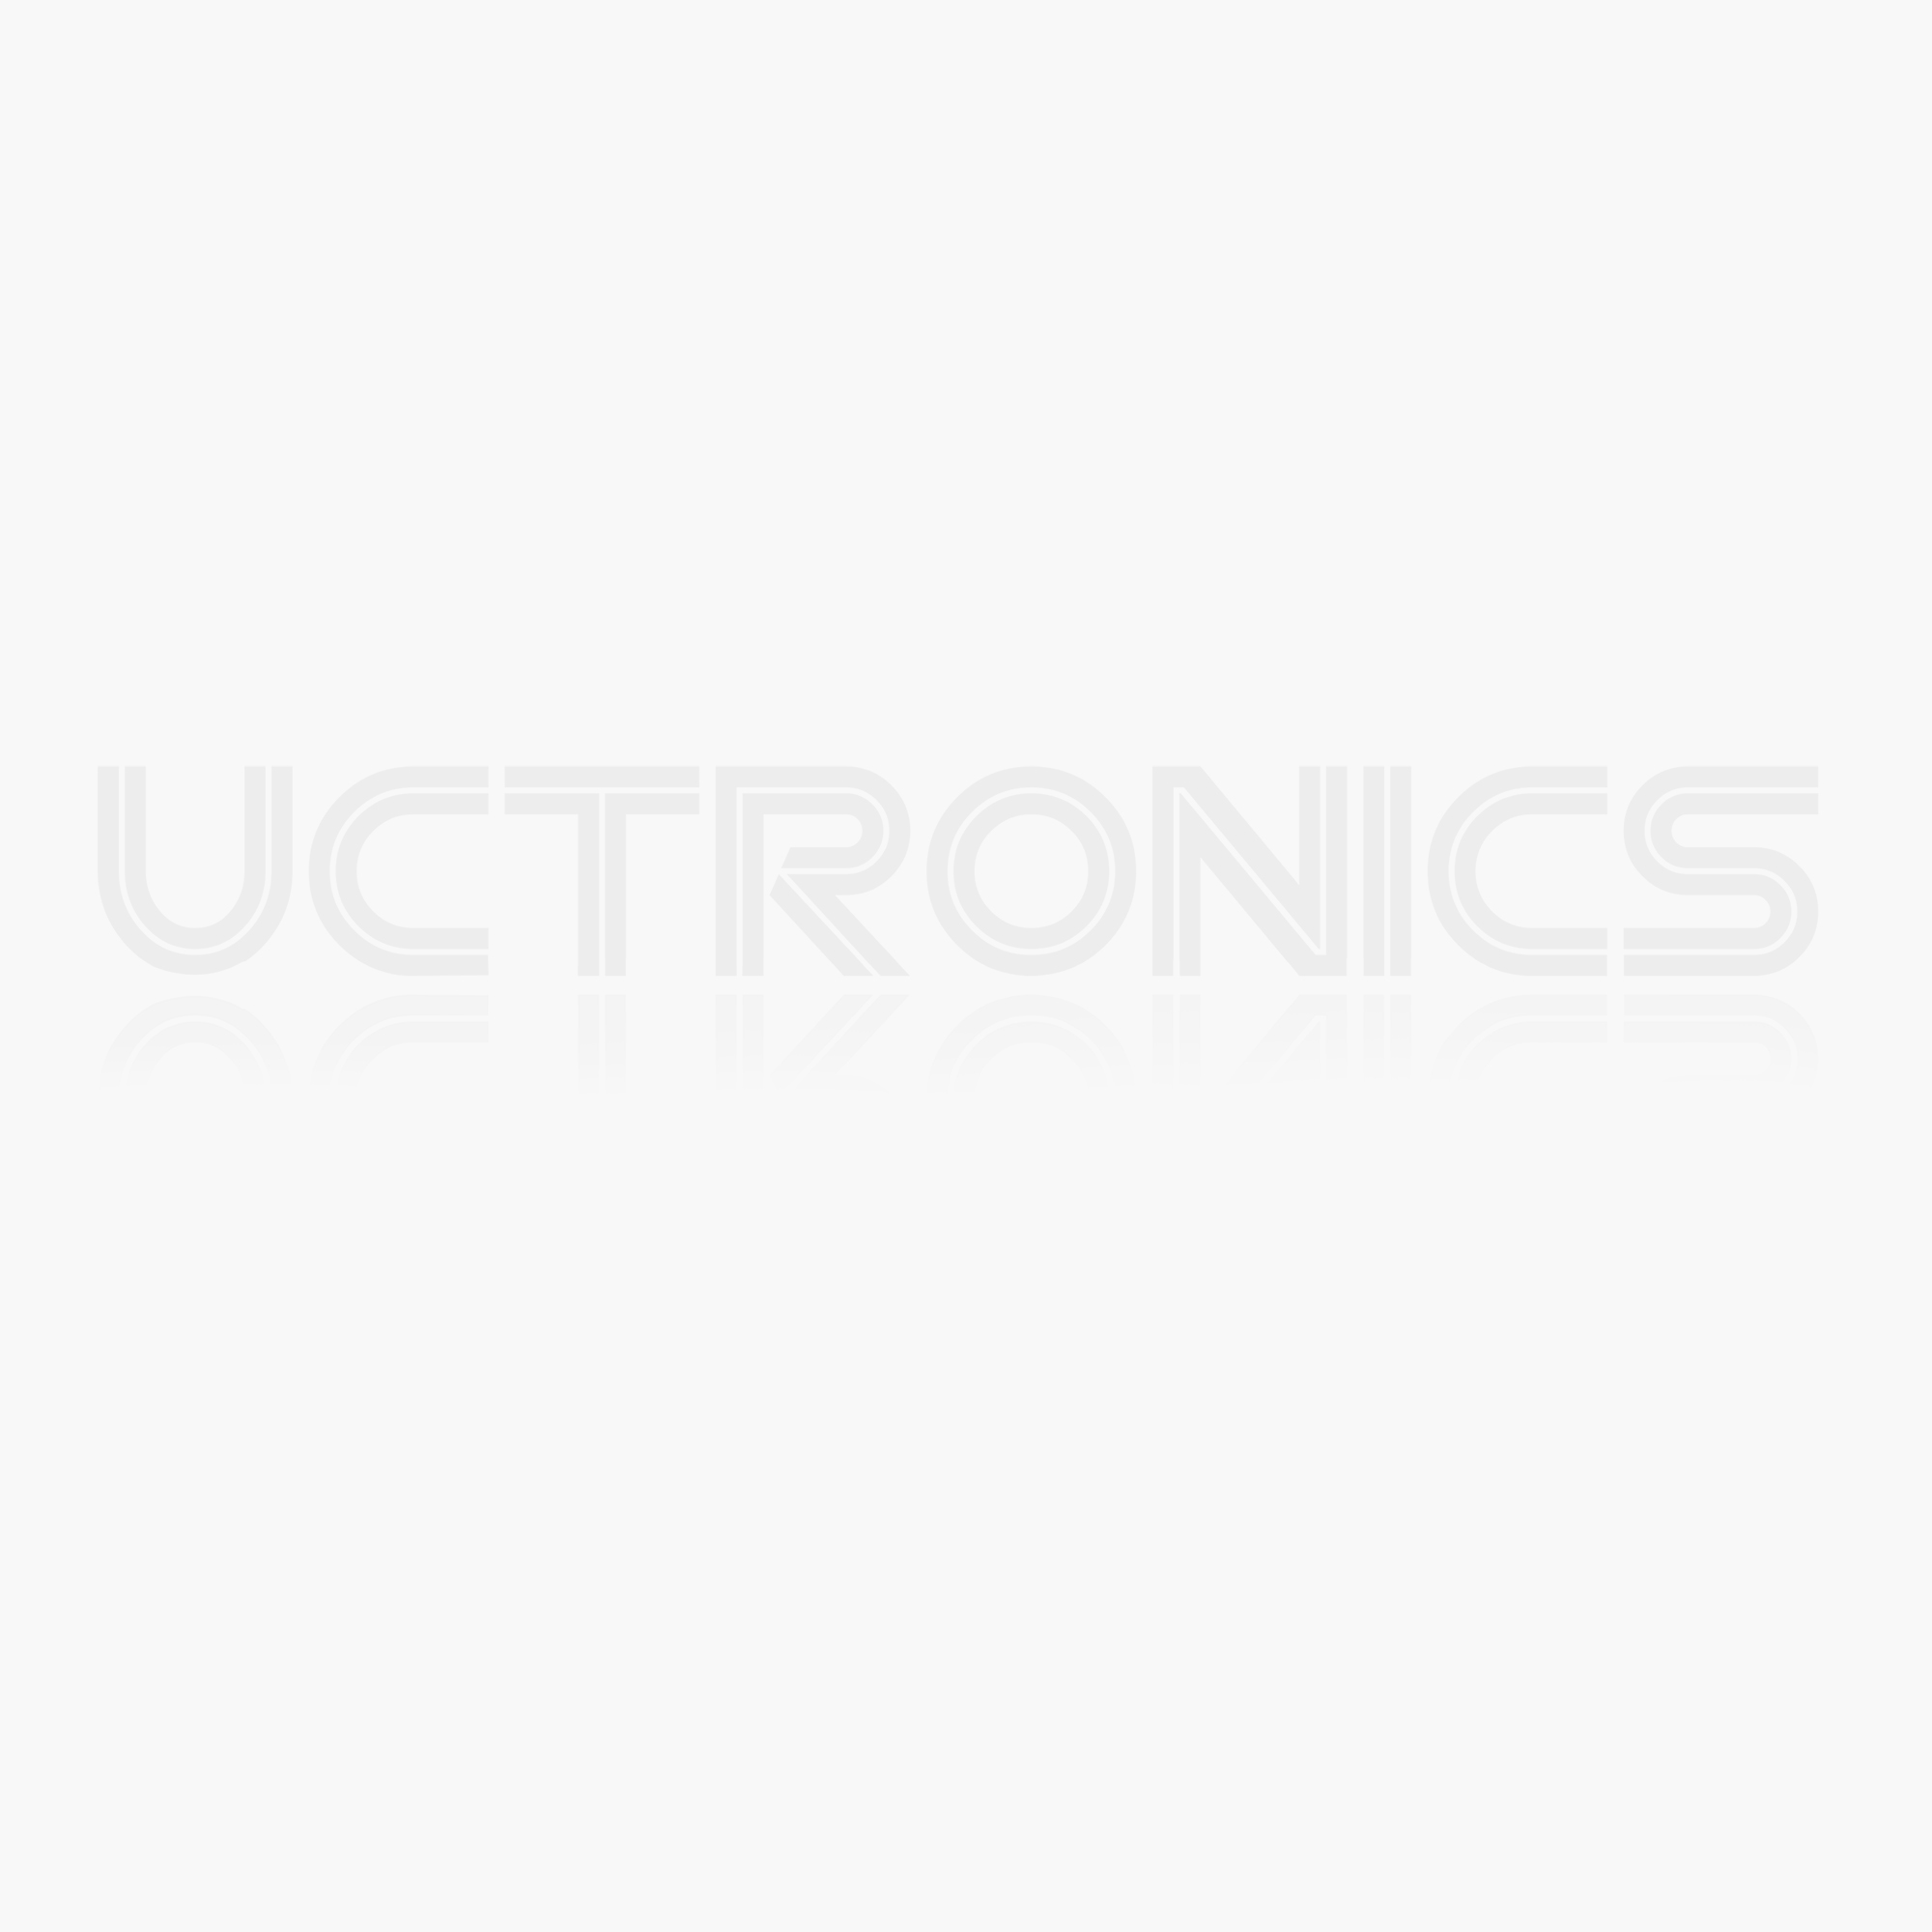 Digital Touch Switch sensor Module #2 for Arduino